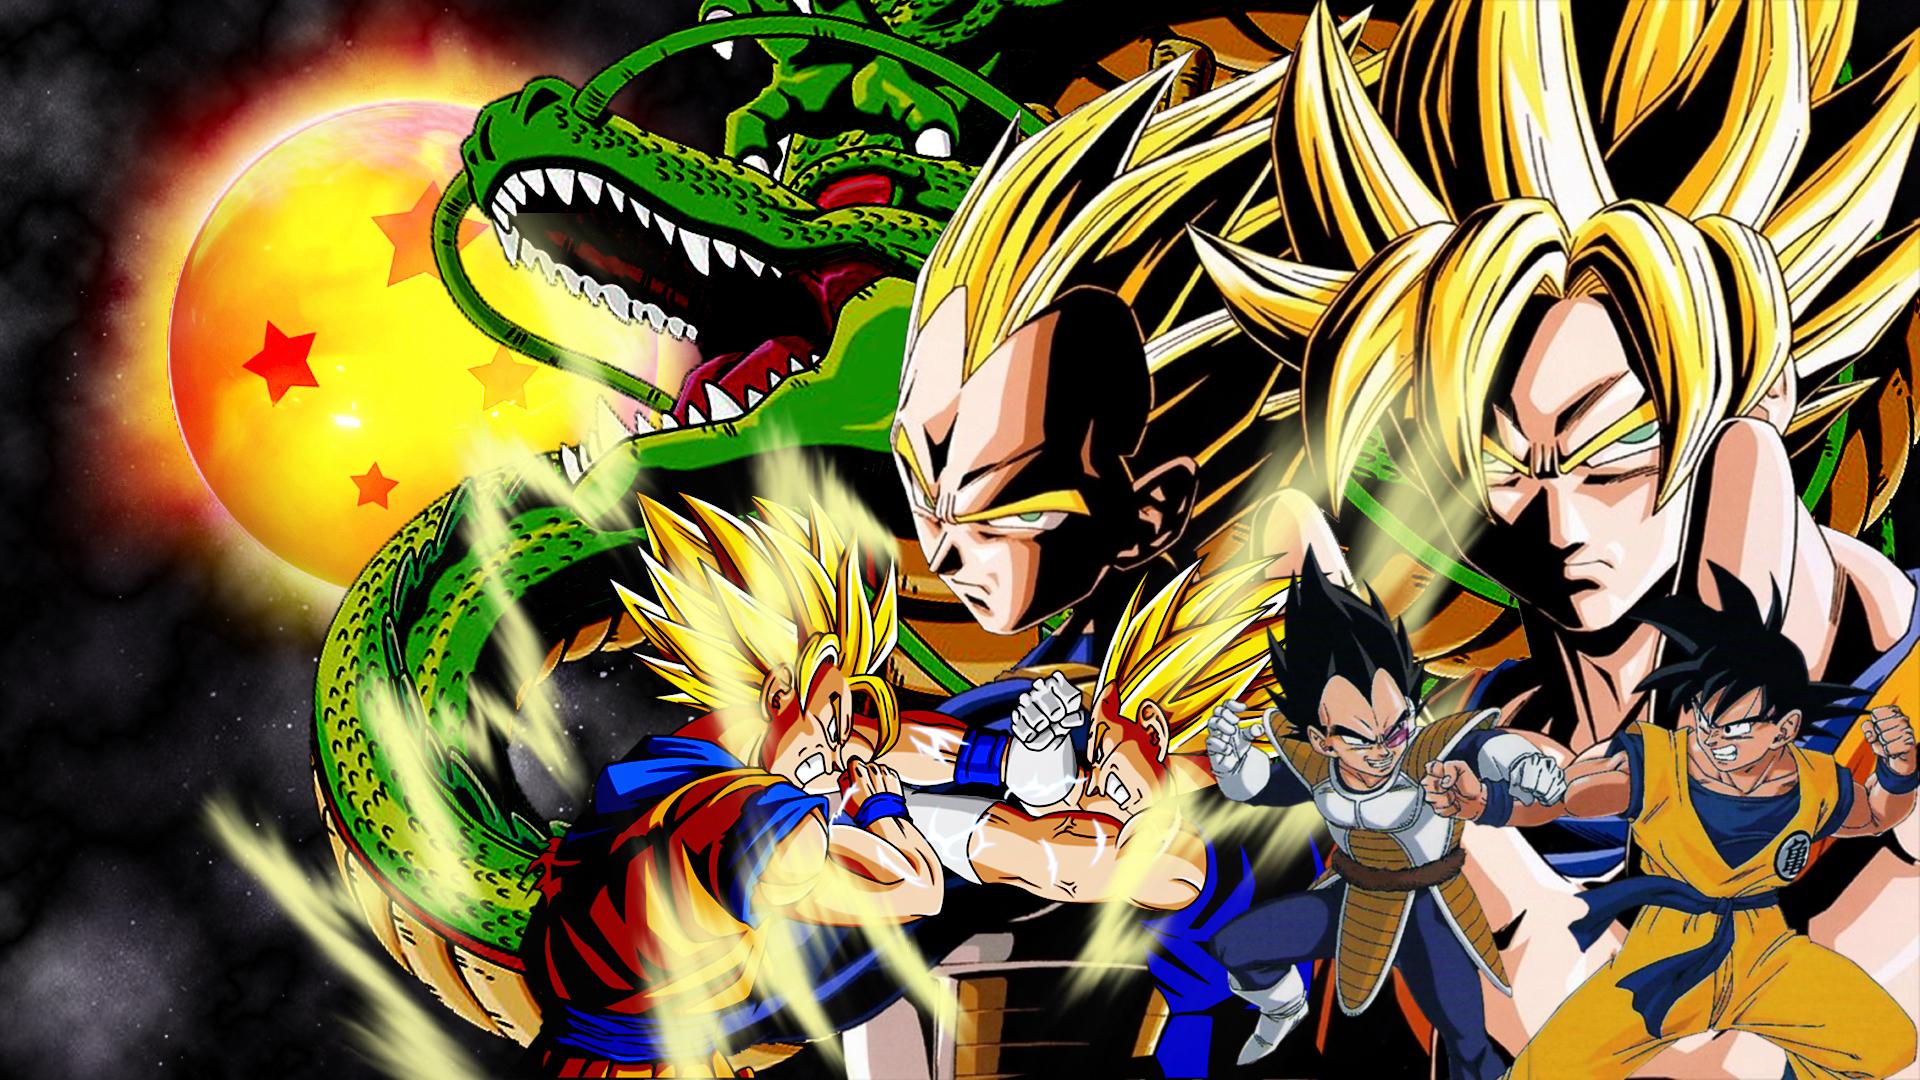 Goku vs vegeta wallpaper by vuLC4no 1920x1080